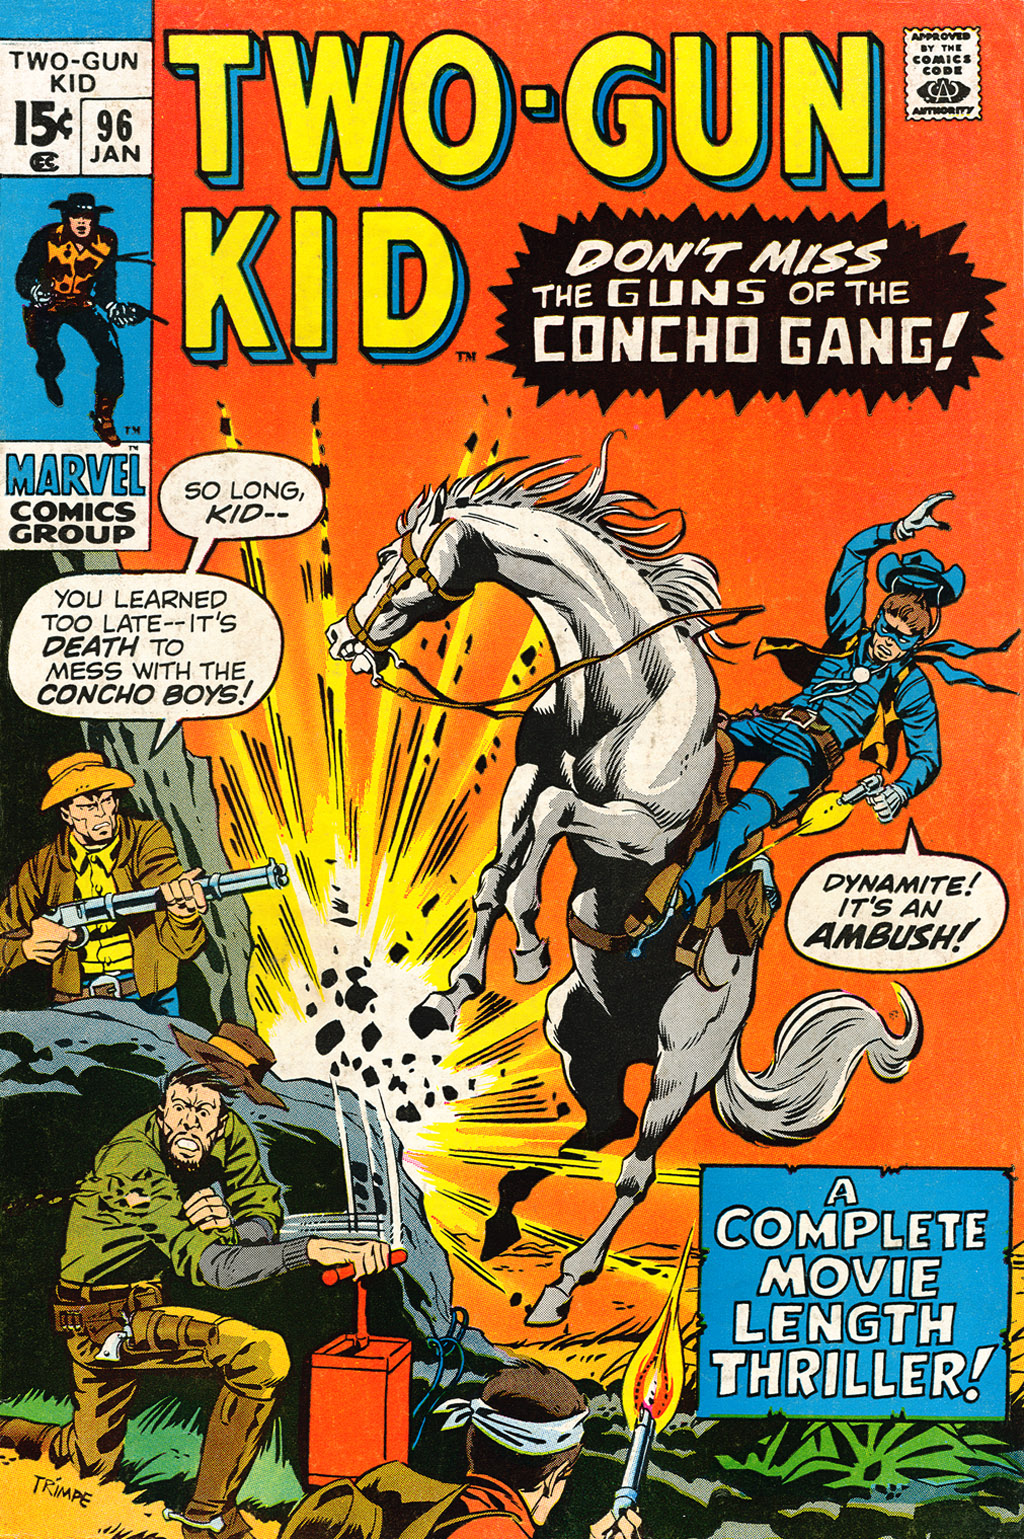 Read online Two-Gun Kid comic -  Issue #96 - 1